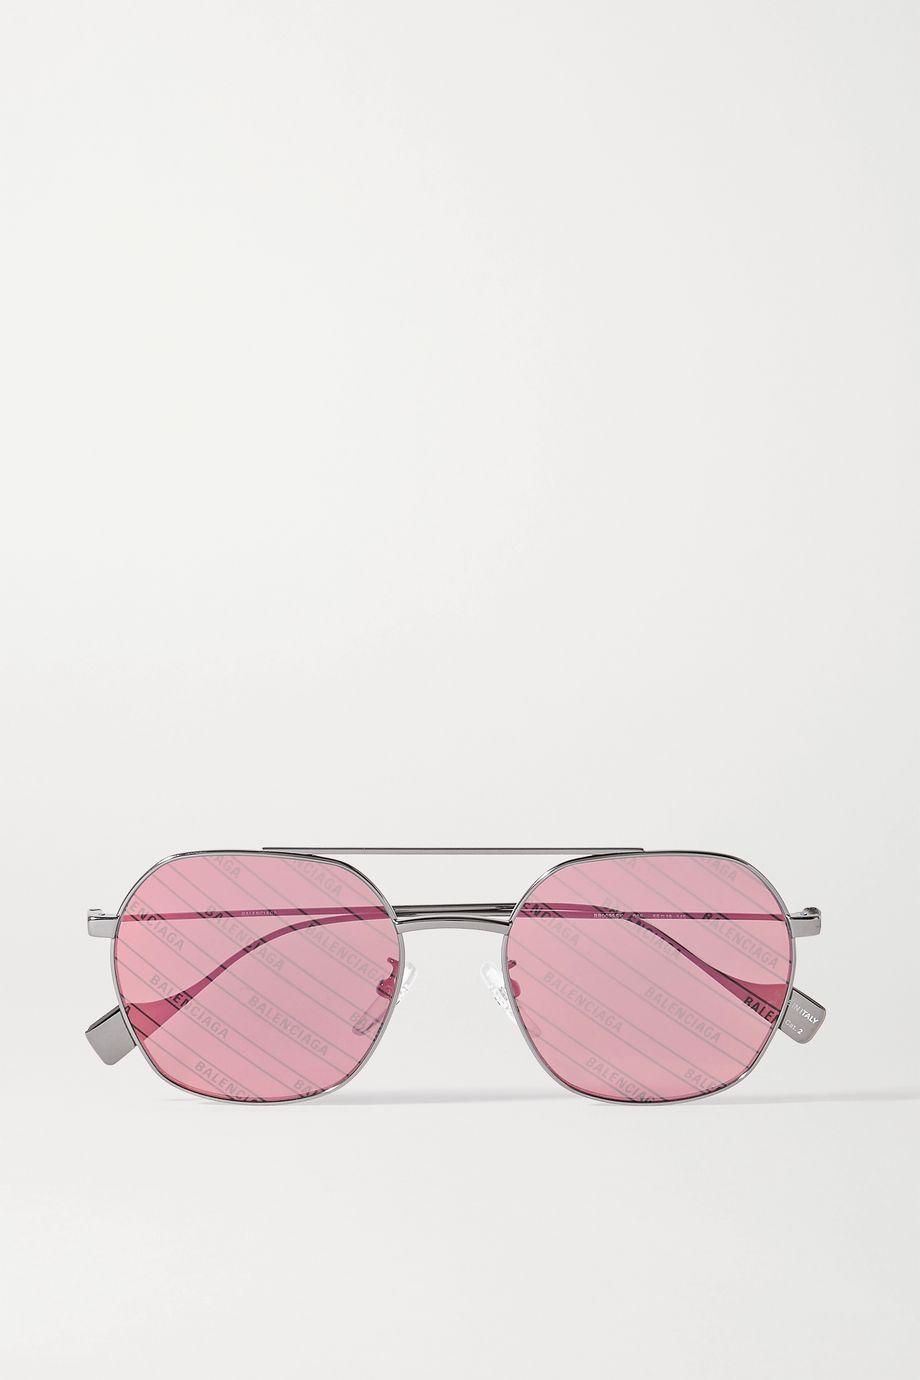 Balenciaga Aviator-style silver-tone sunglasses